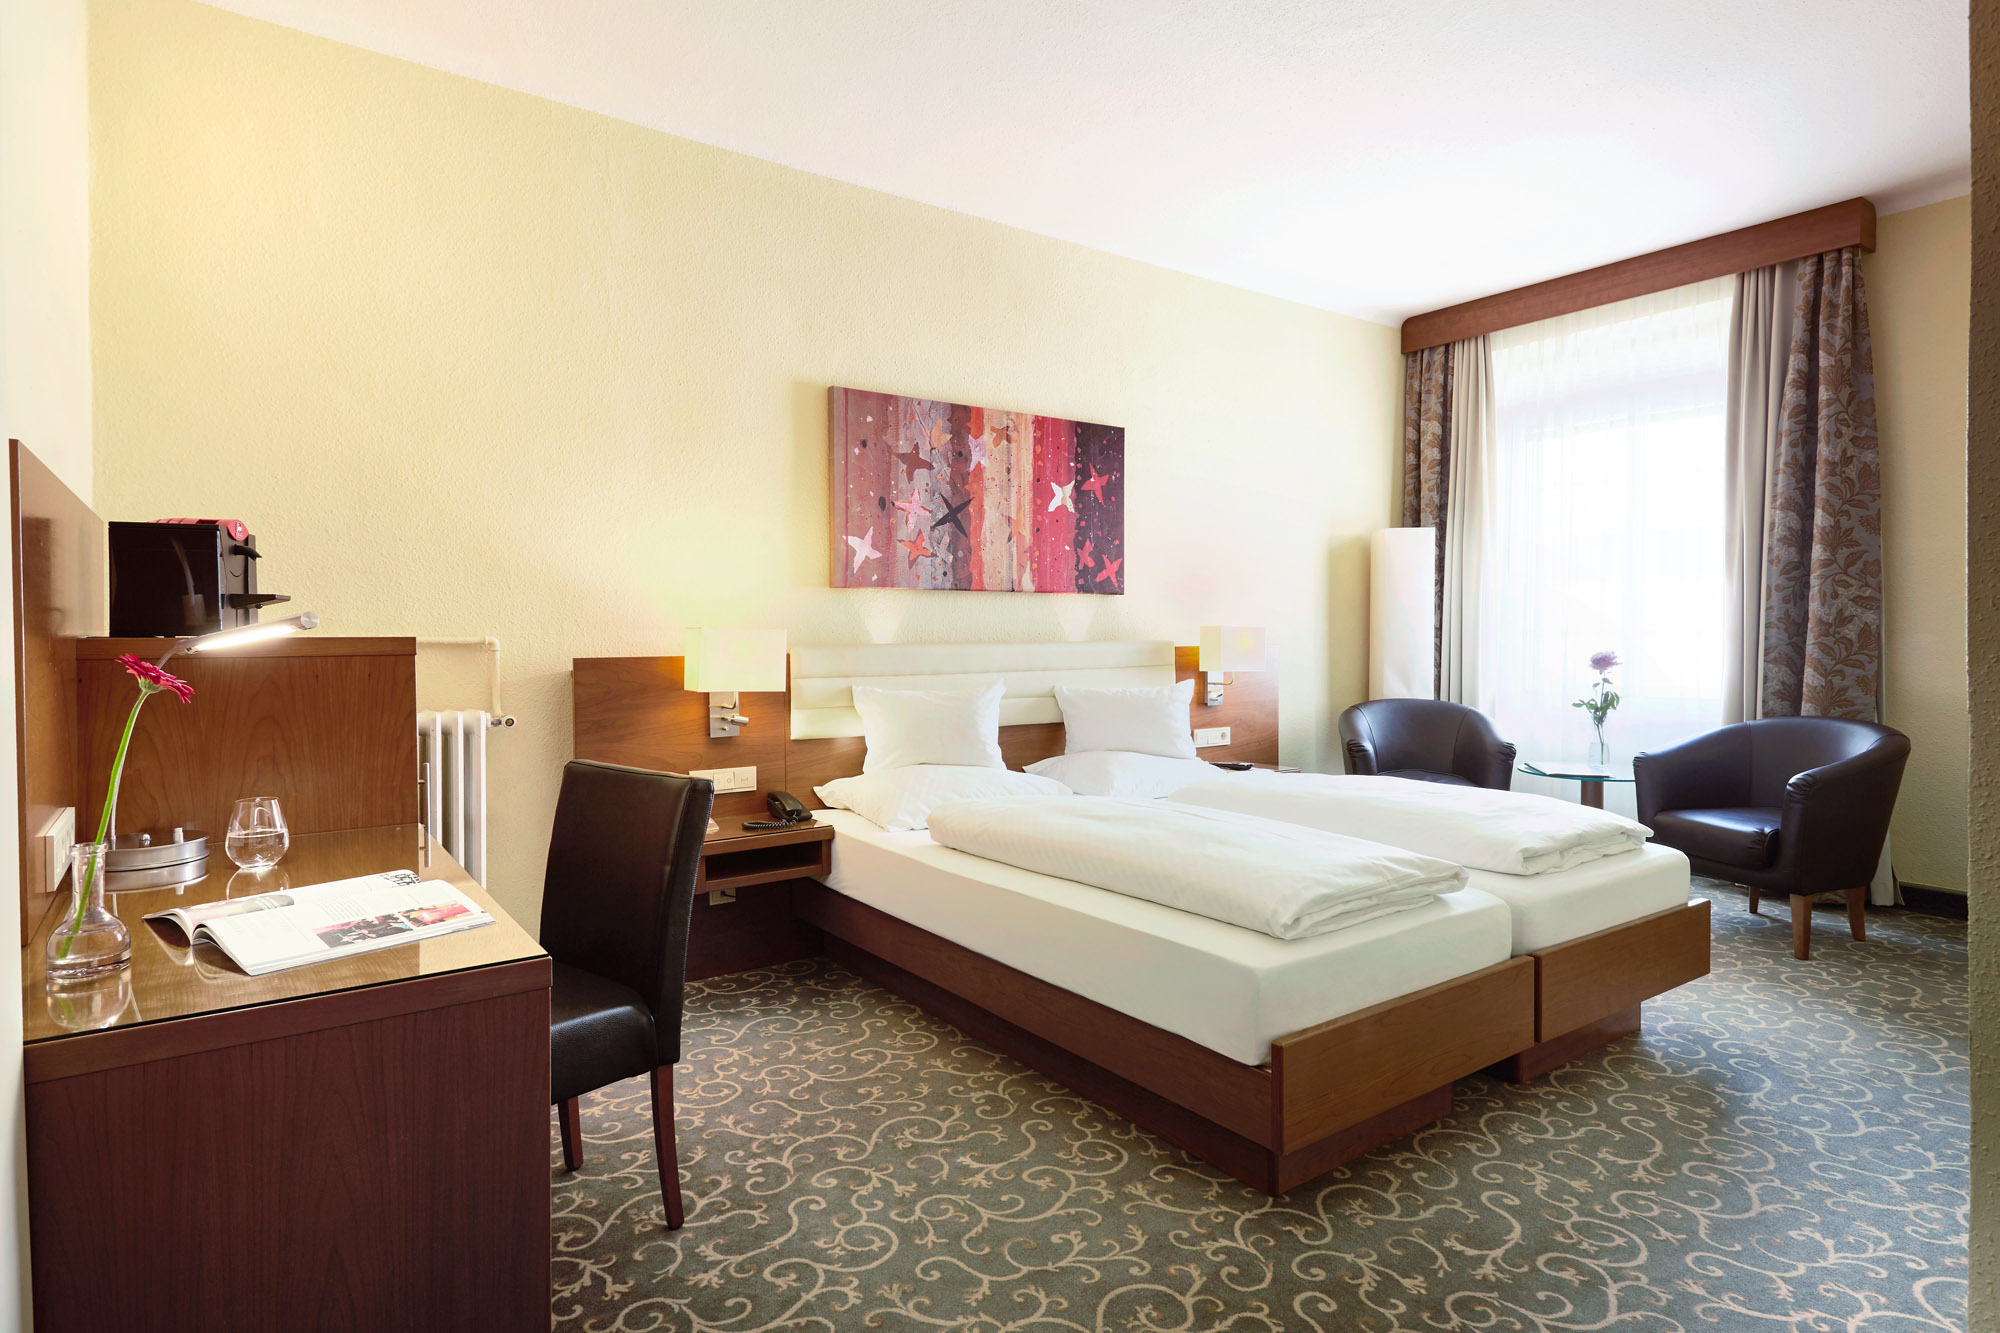 Doppelzimmer Classic ab € 131,50 pro Nacht inklusive Frühstück & Ortstaxe